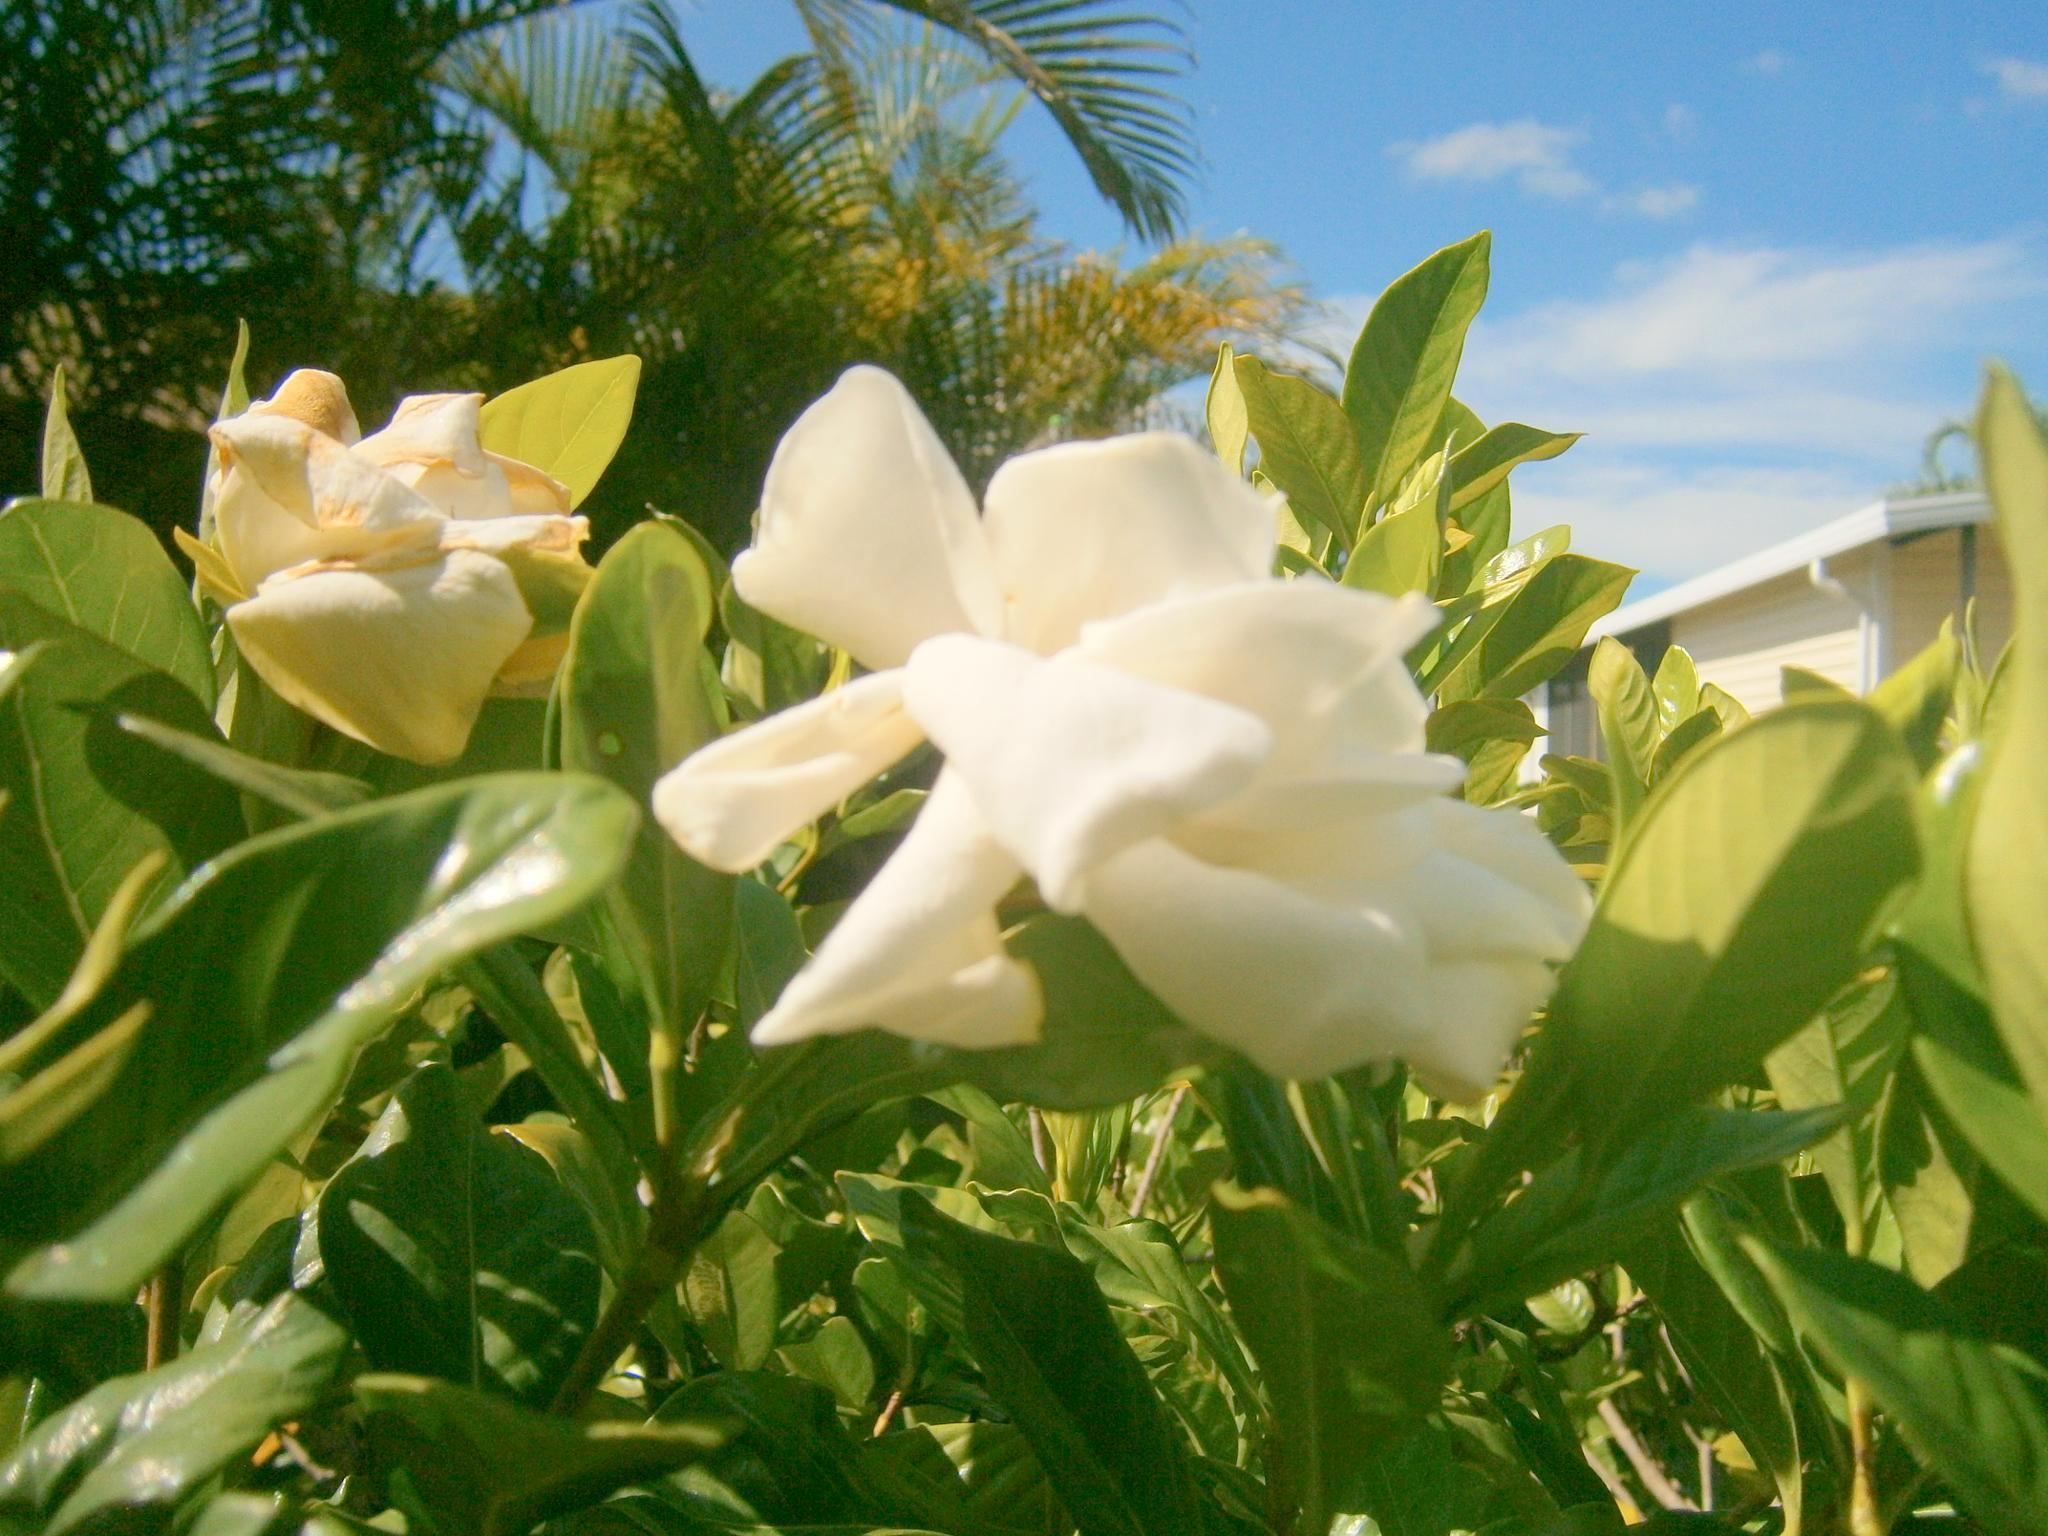 Gardenia by Marion